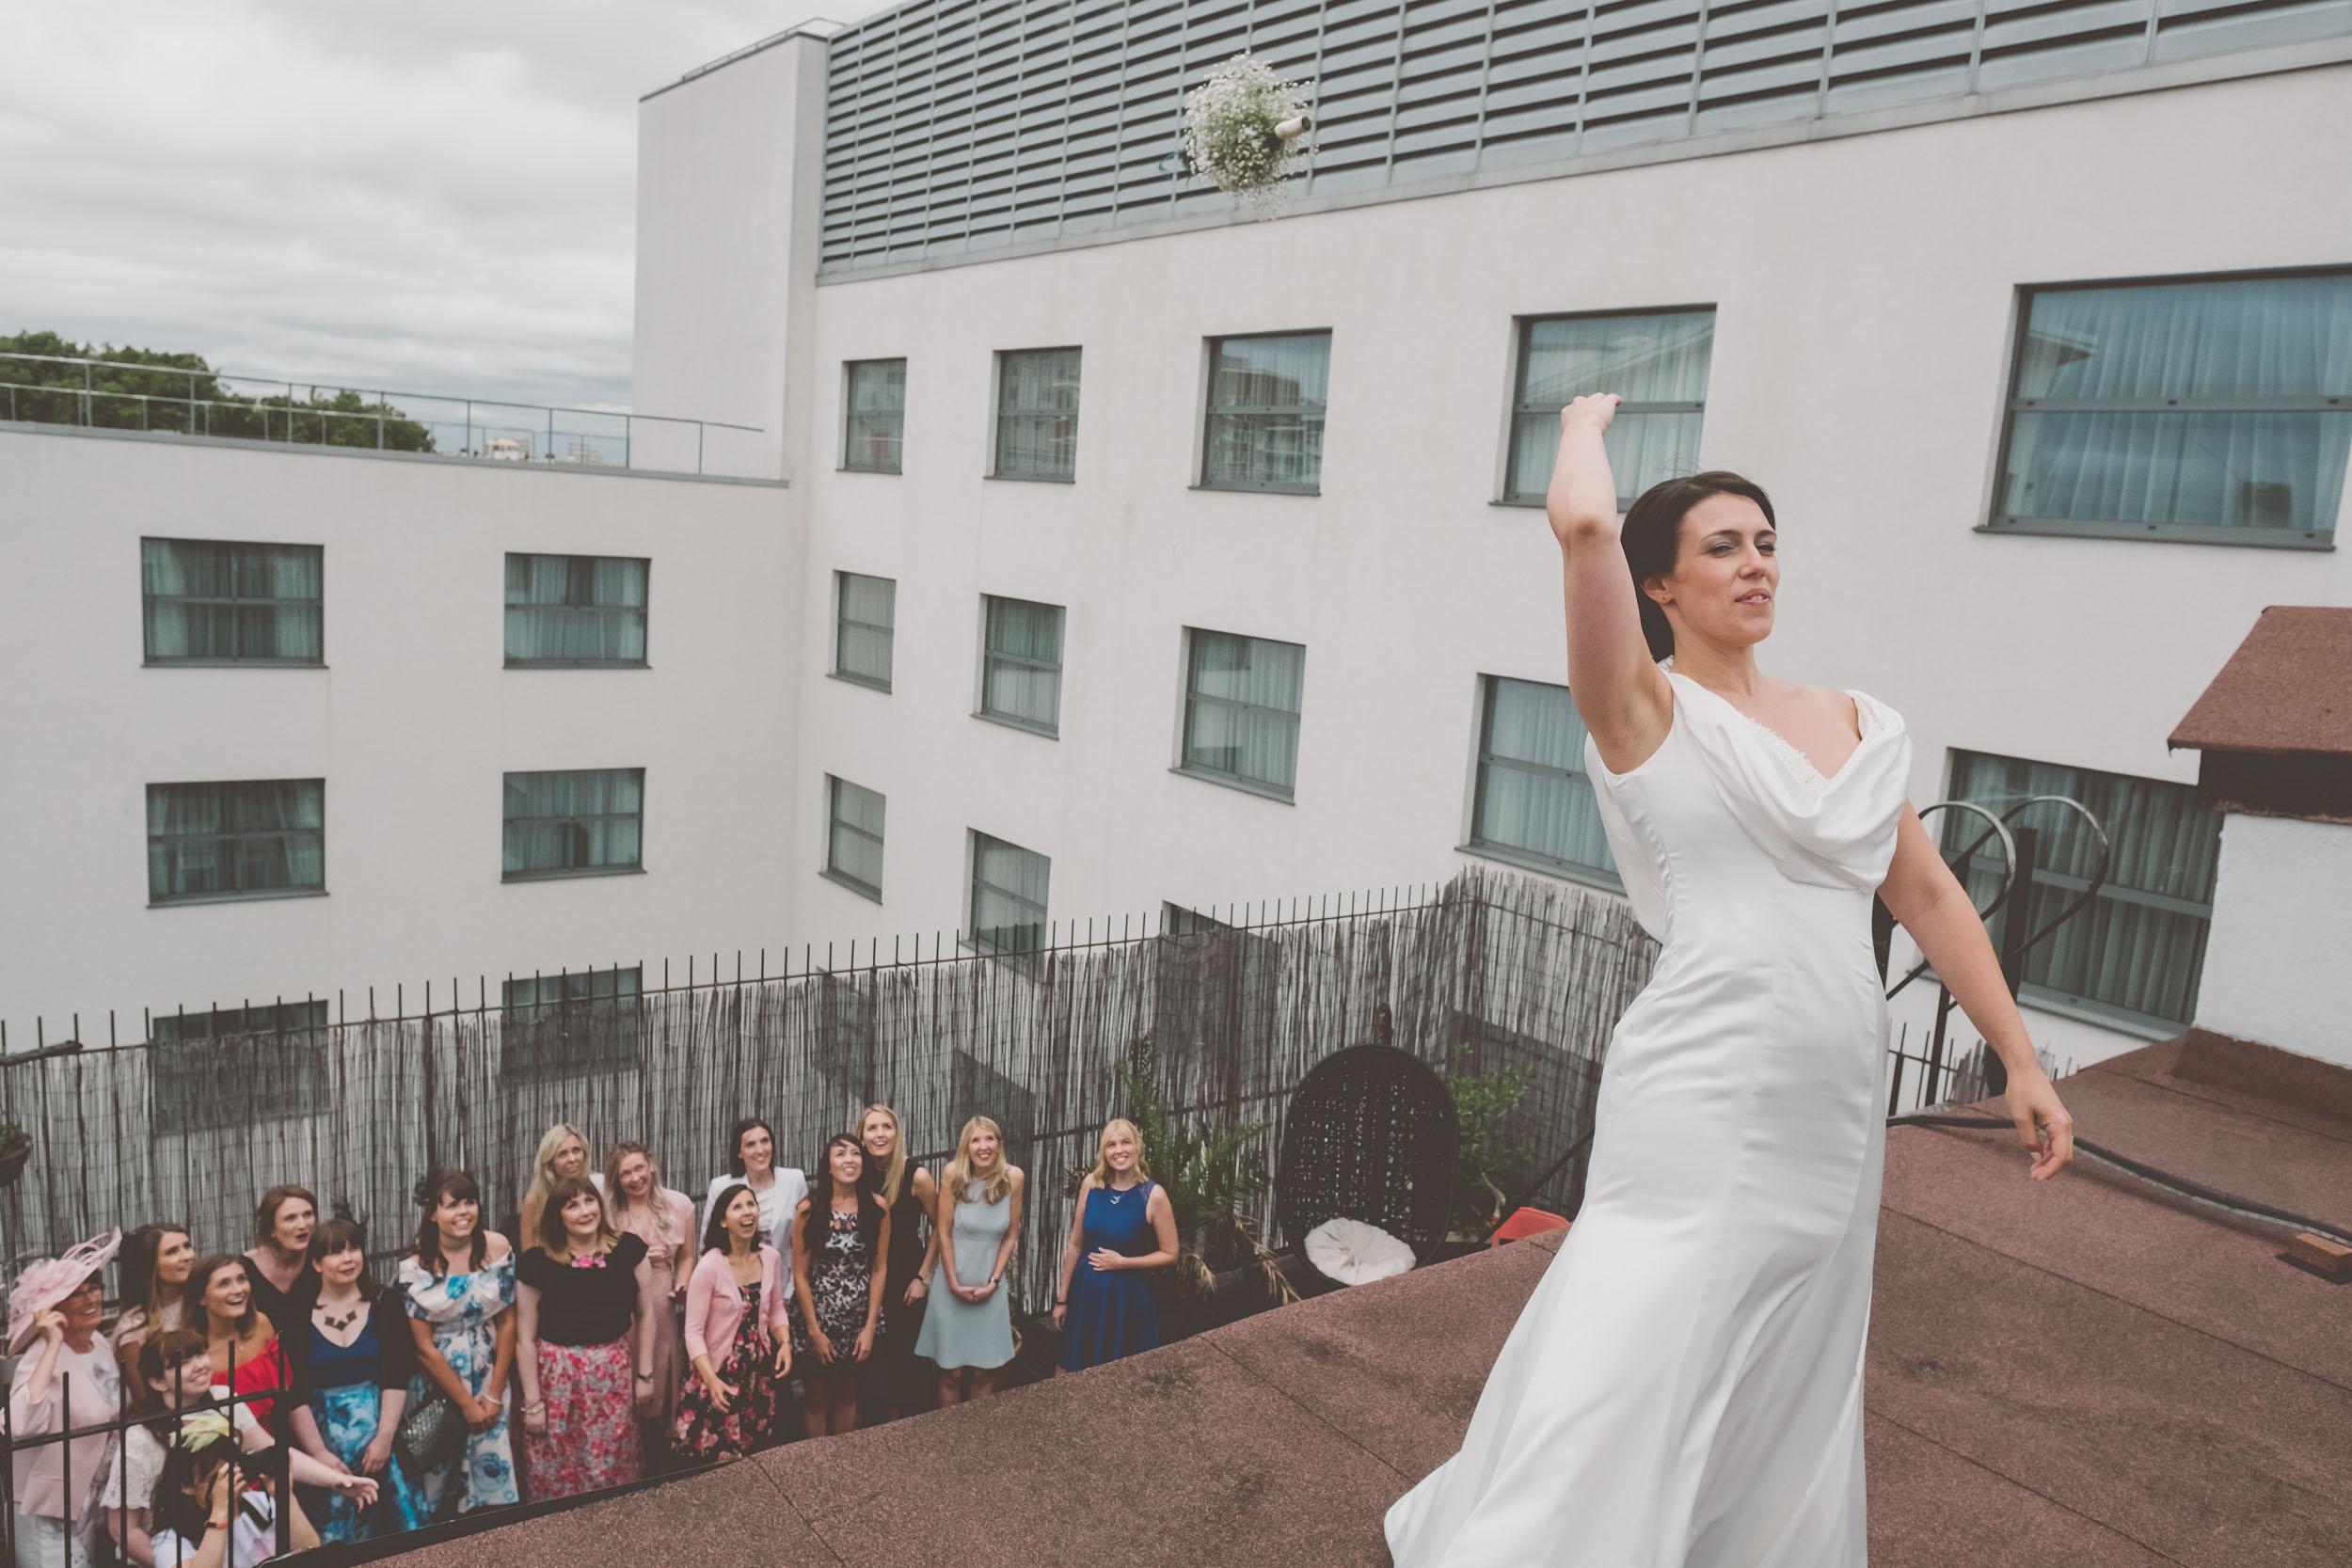 islington-town-hall-4th-floor-studios-wedding270.jpg